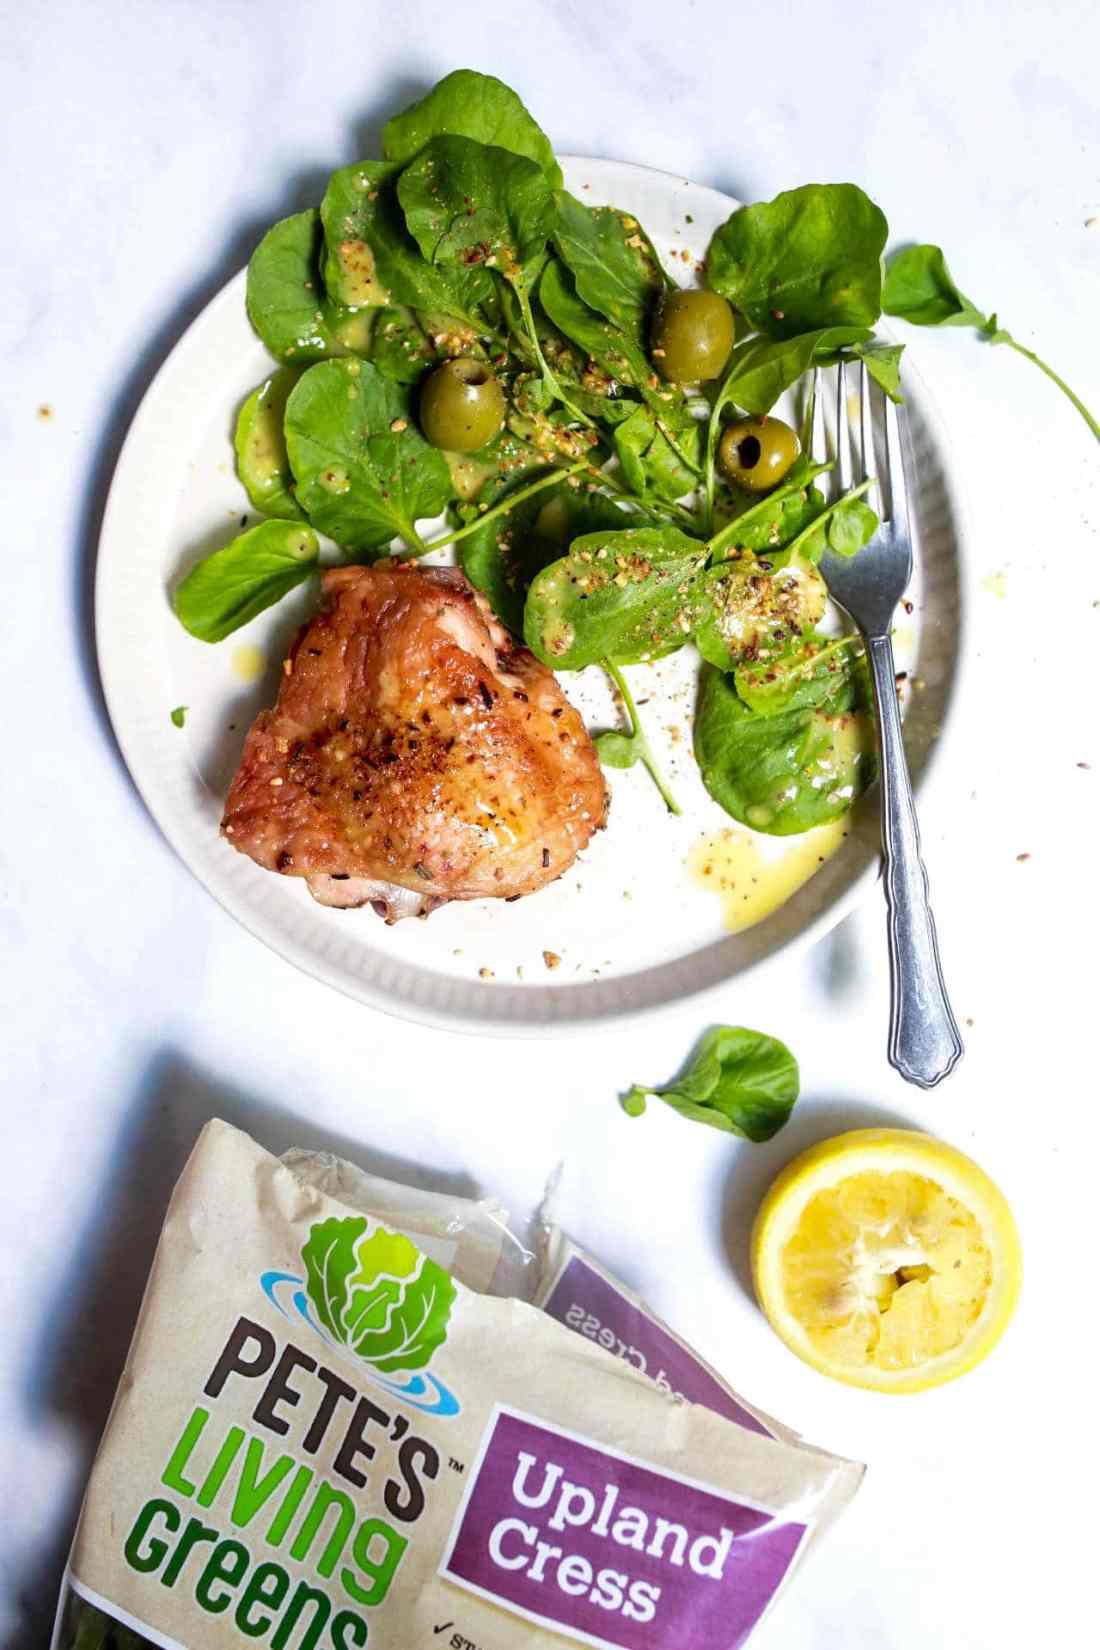 Watercress salad with lemon vinaigrette